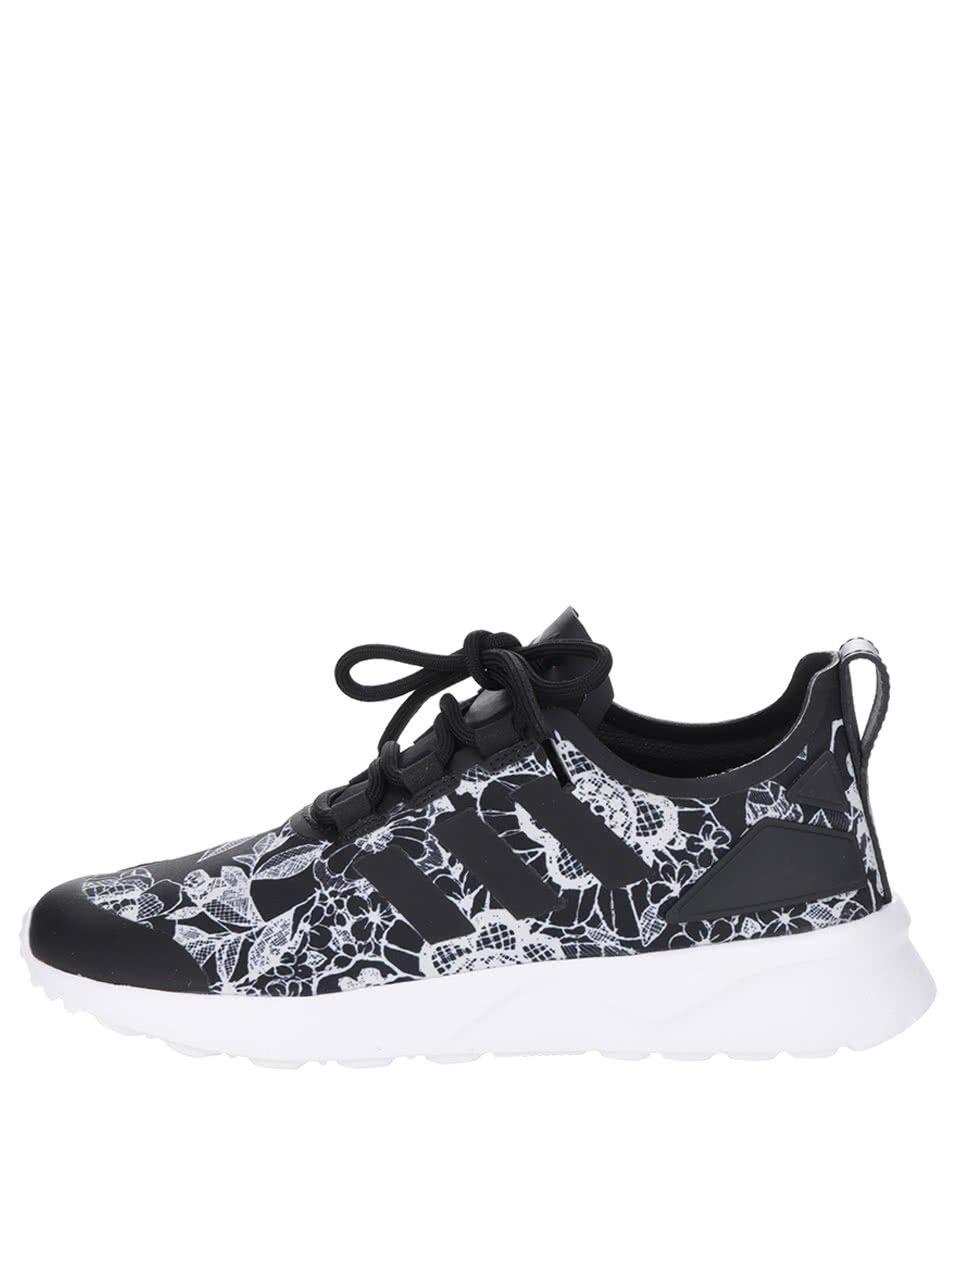 Čierno-biele dámske tenisky adidas Originals ZX Flux    dressie.sk 05367a8a9a1